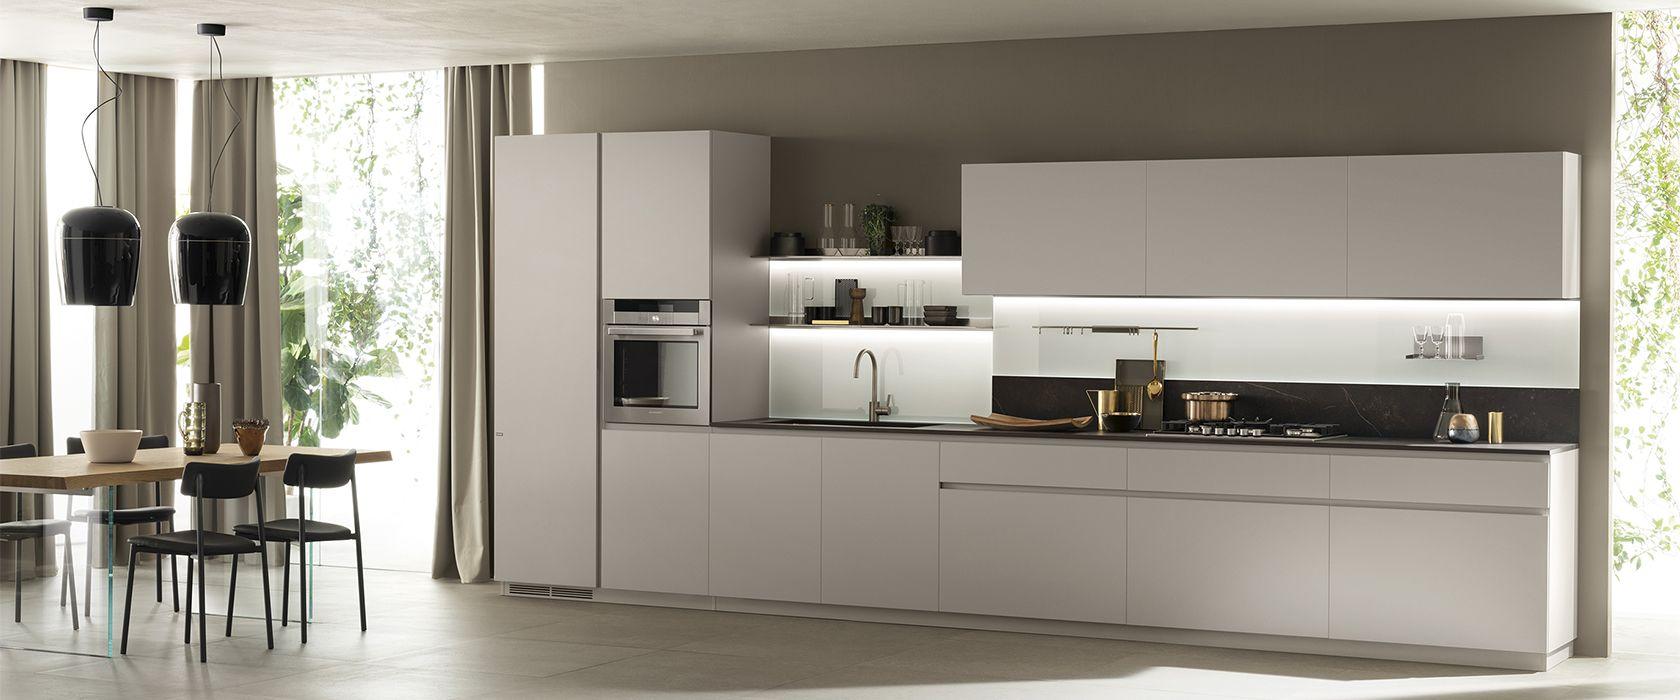 Cucina classica bianca Scavolini home nel 2019 Mobili